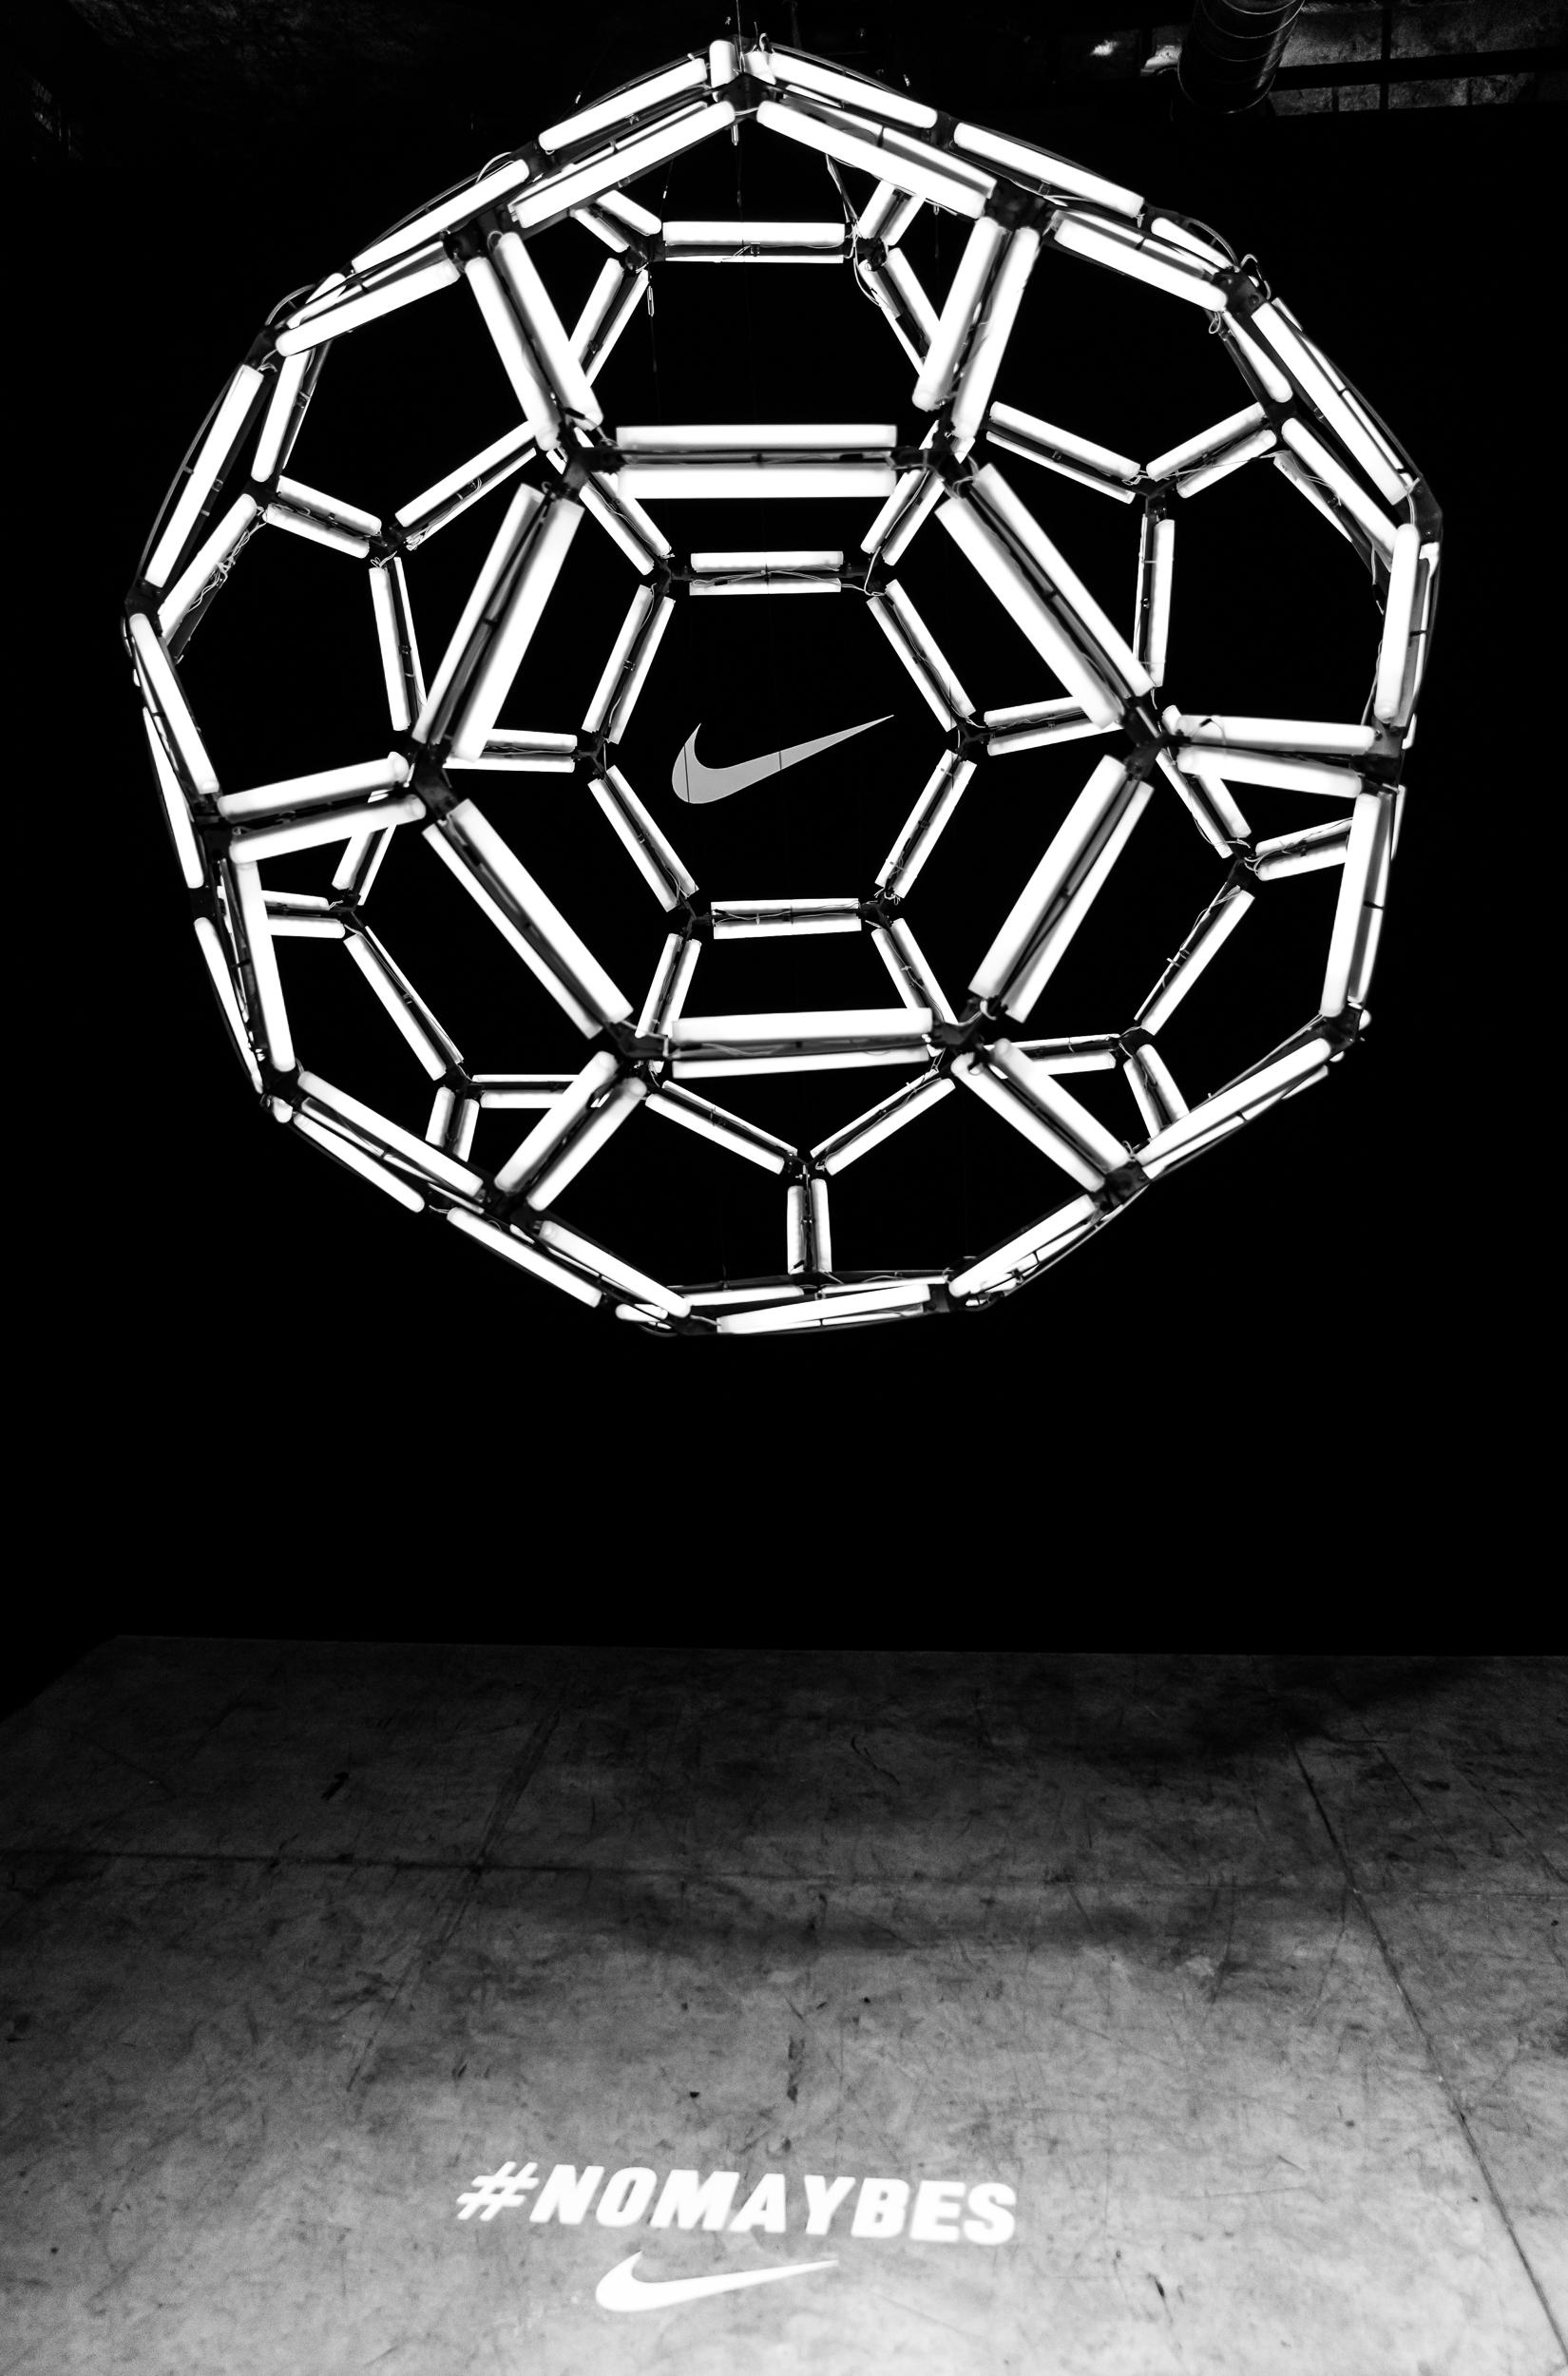 NIKE-Underground-image3.jpg